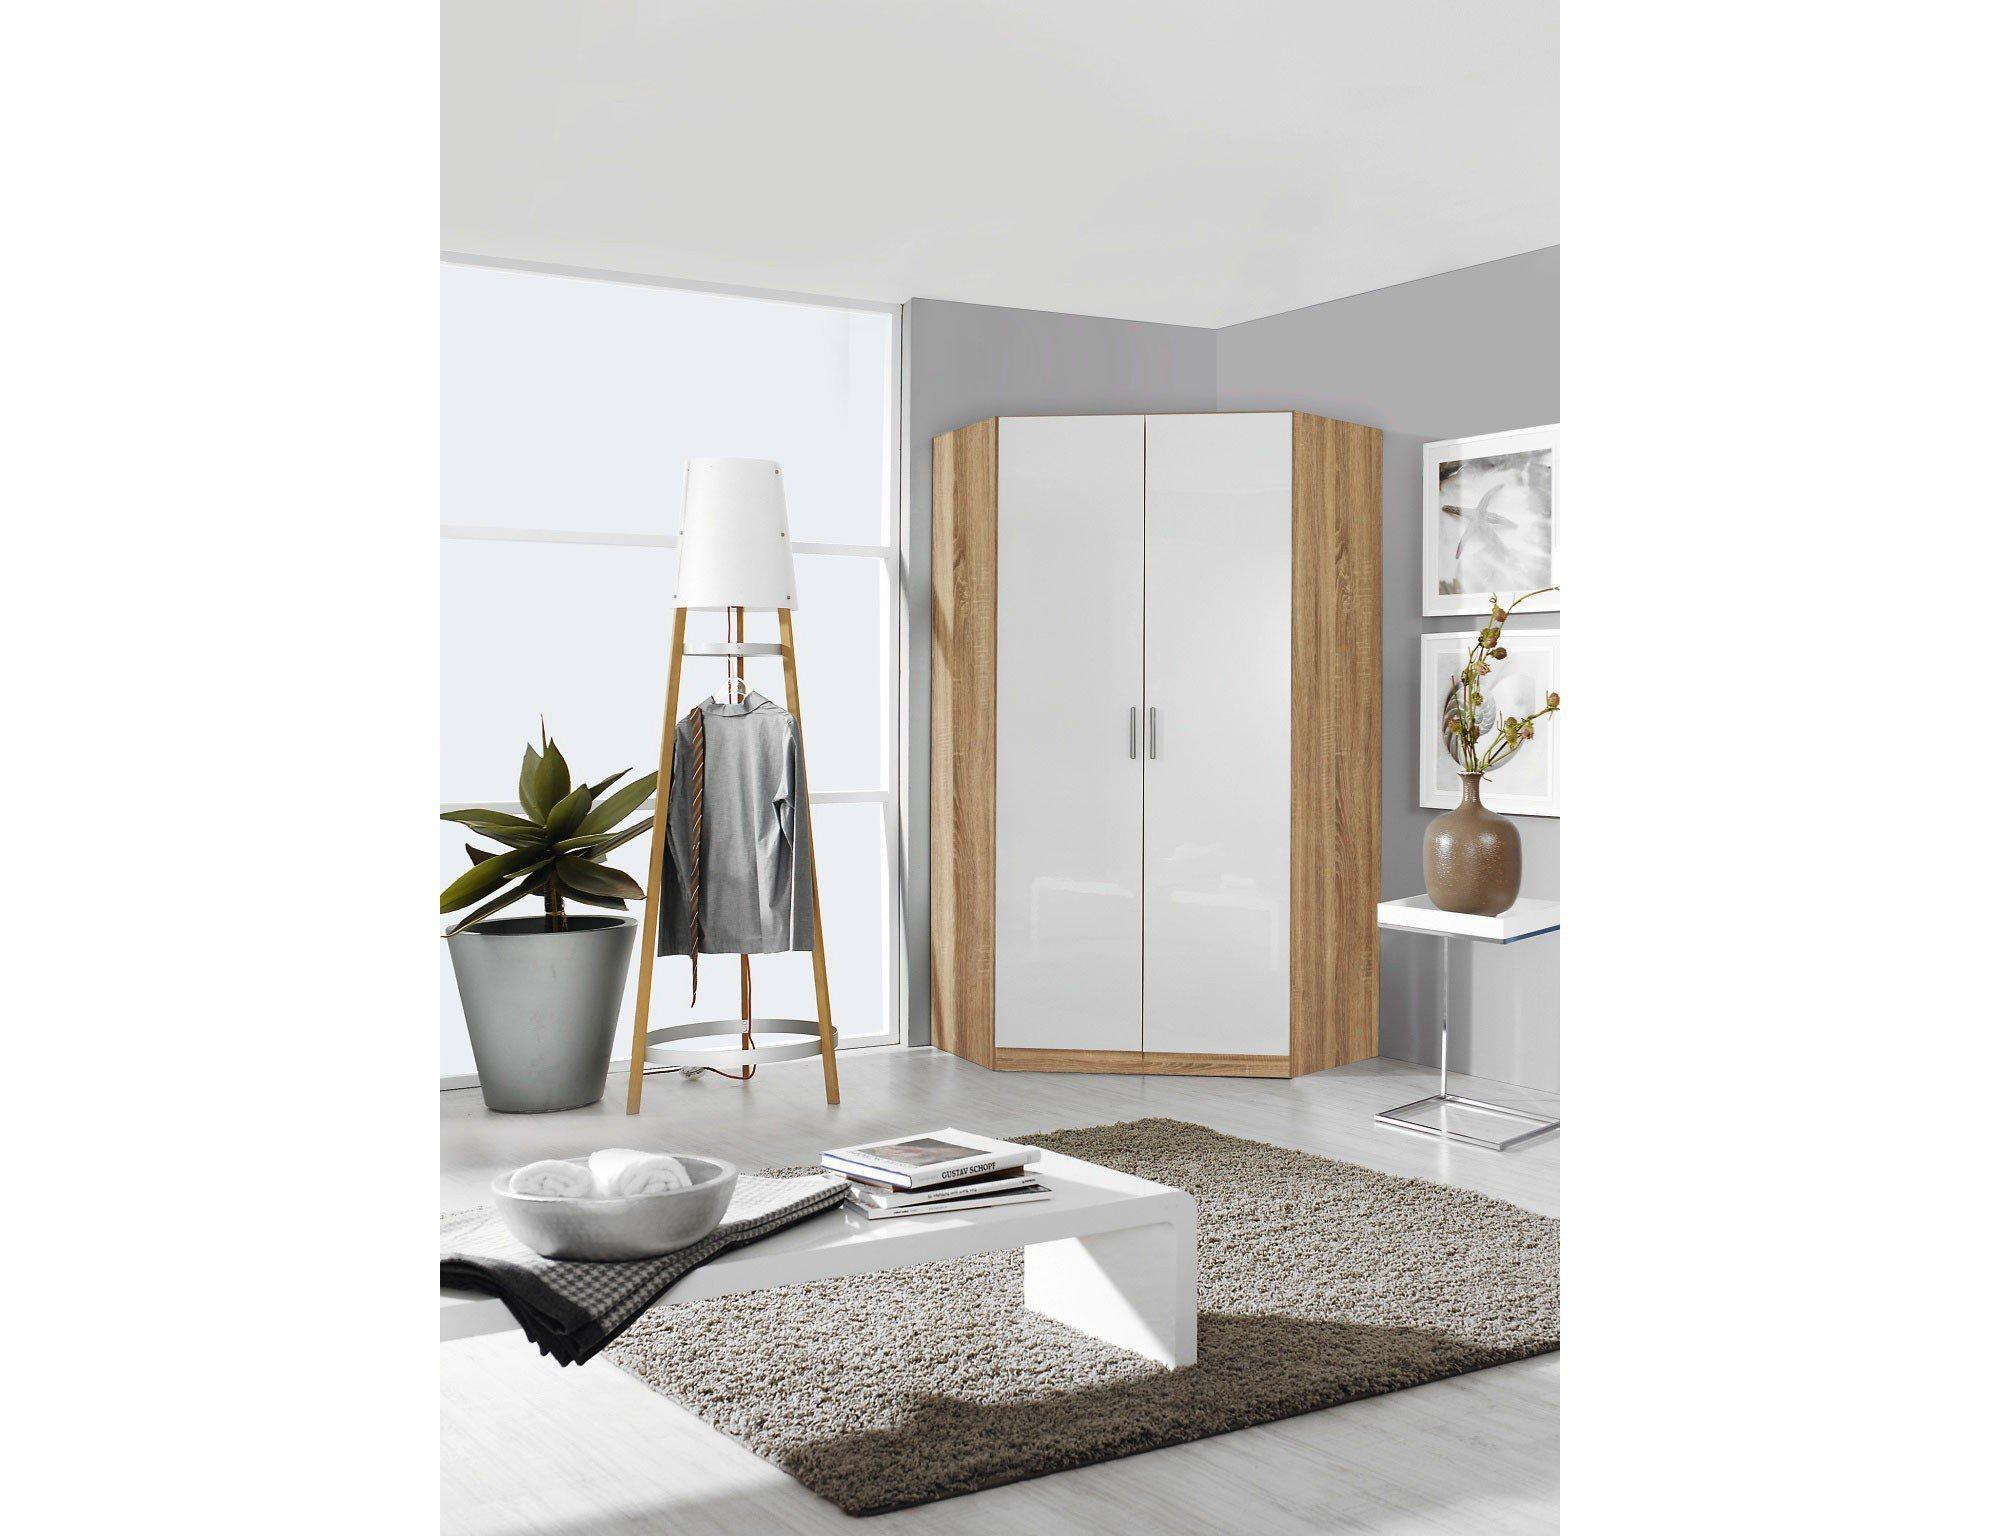 badezimmer m bel celle vitra bad f r das handwerk martin deppner gmbh heizung. Black Bedroom Furniture Sets. Home Design Ideas